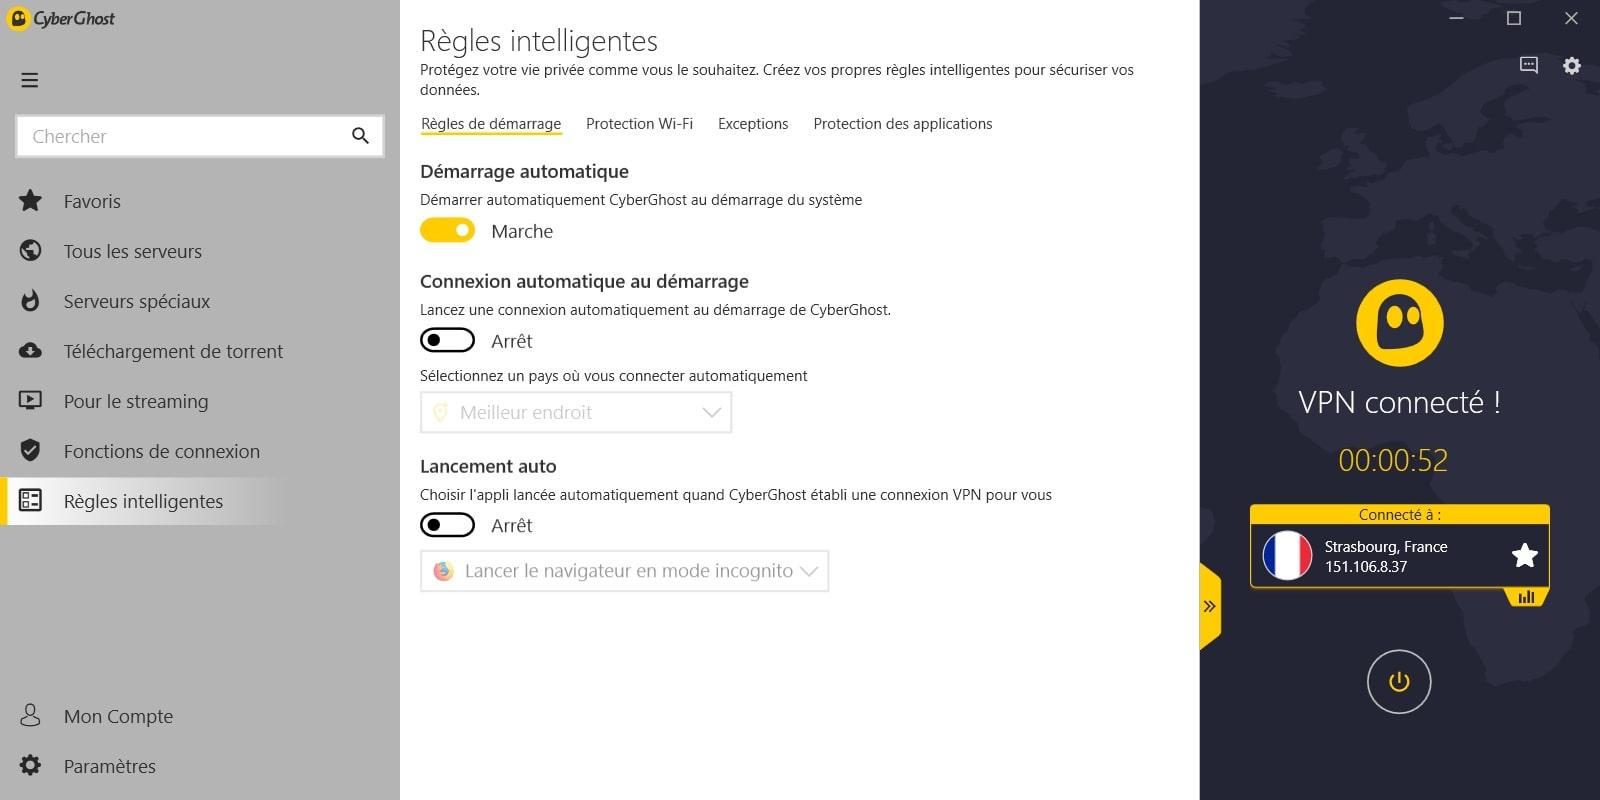 Regles intelligentes Cyberghost (1)